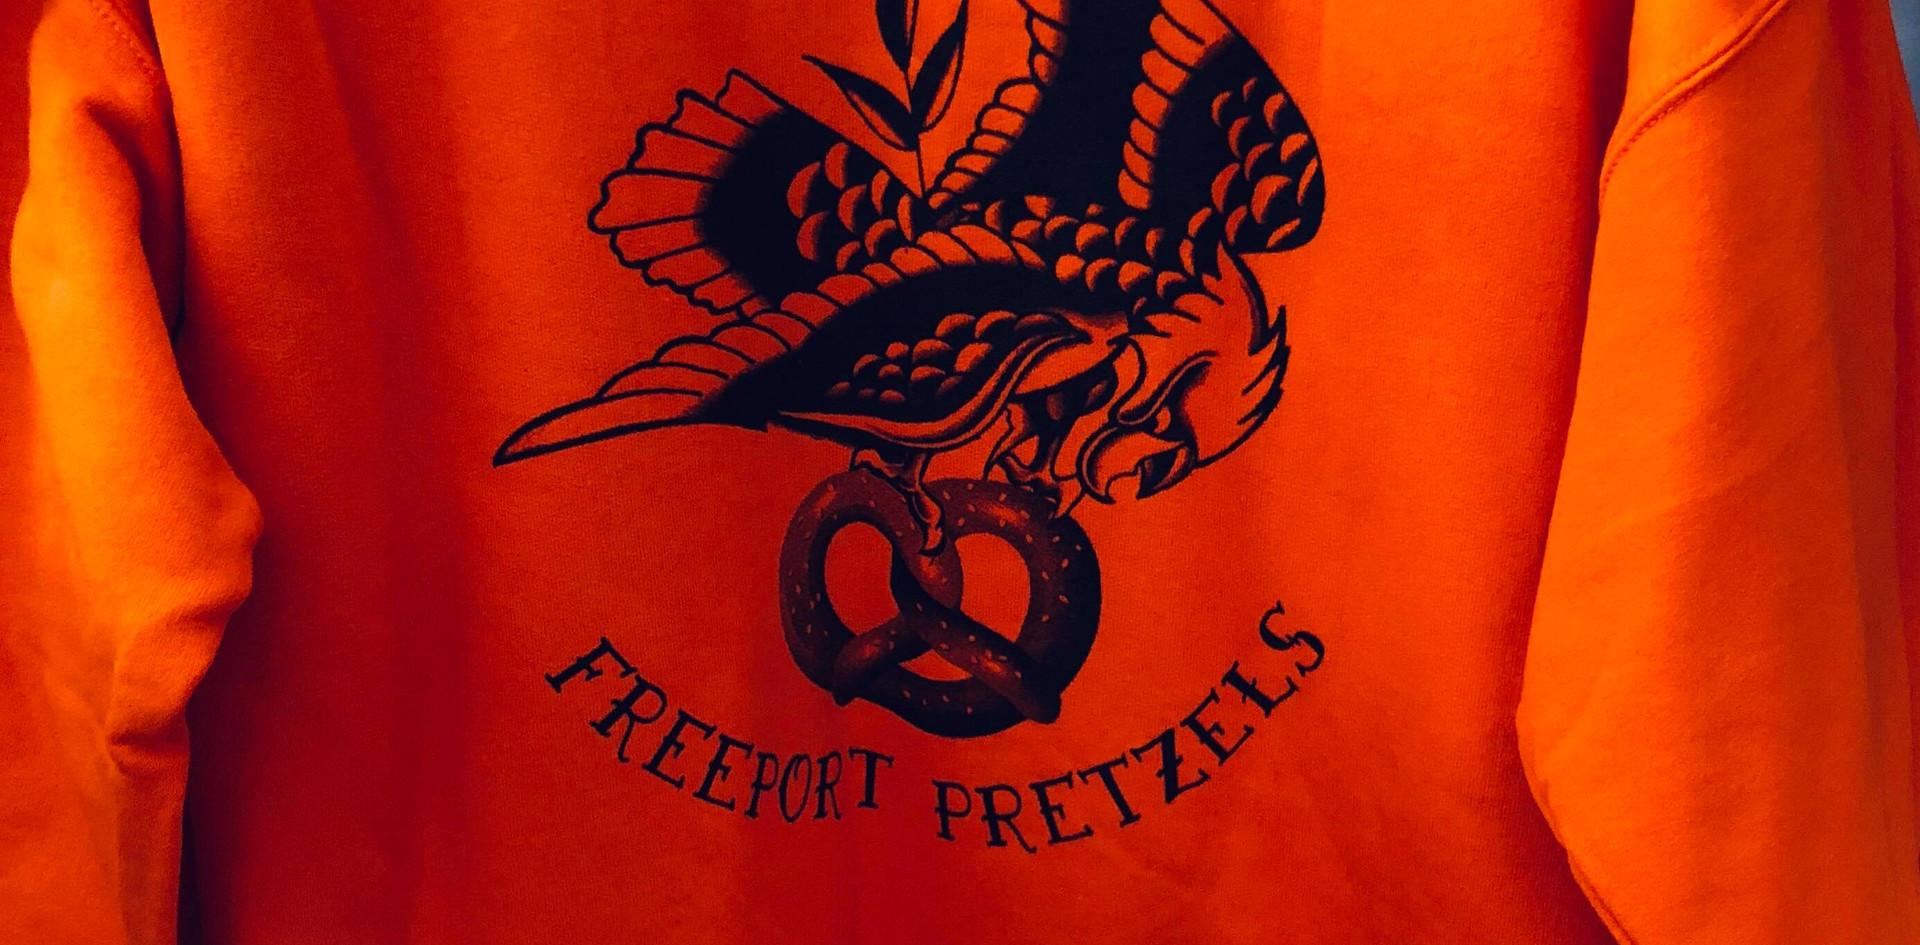 Freeport Pretzels Eagle